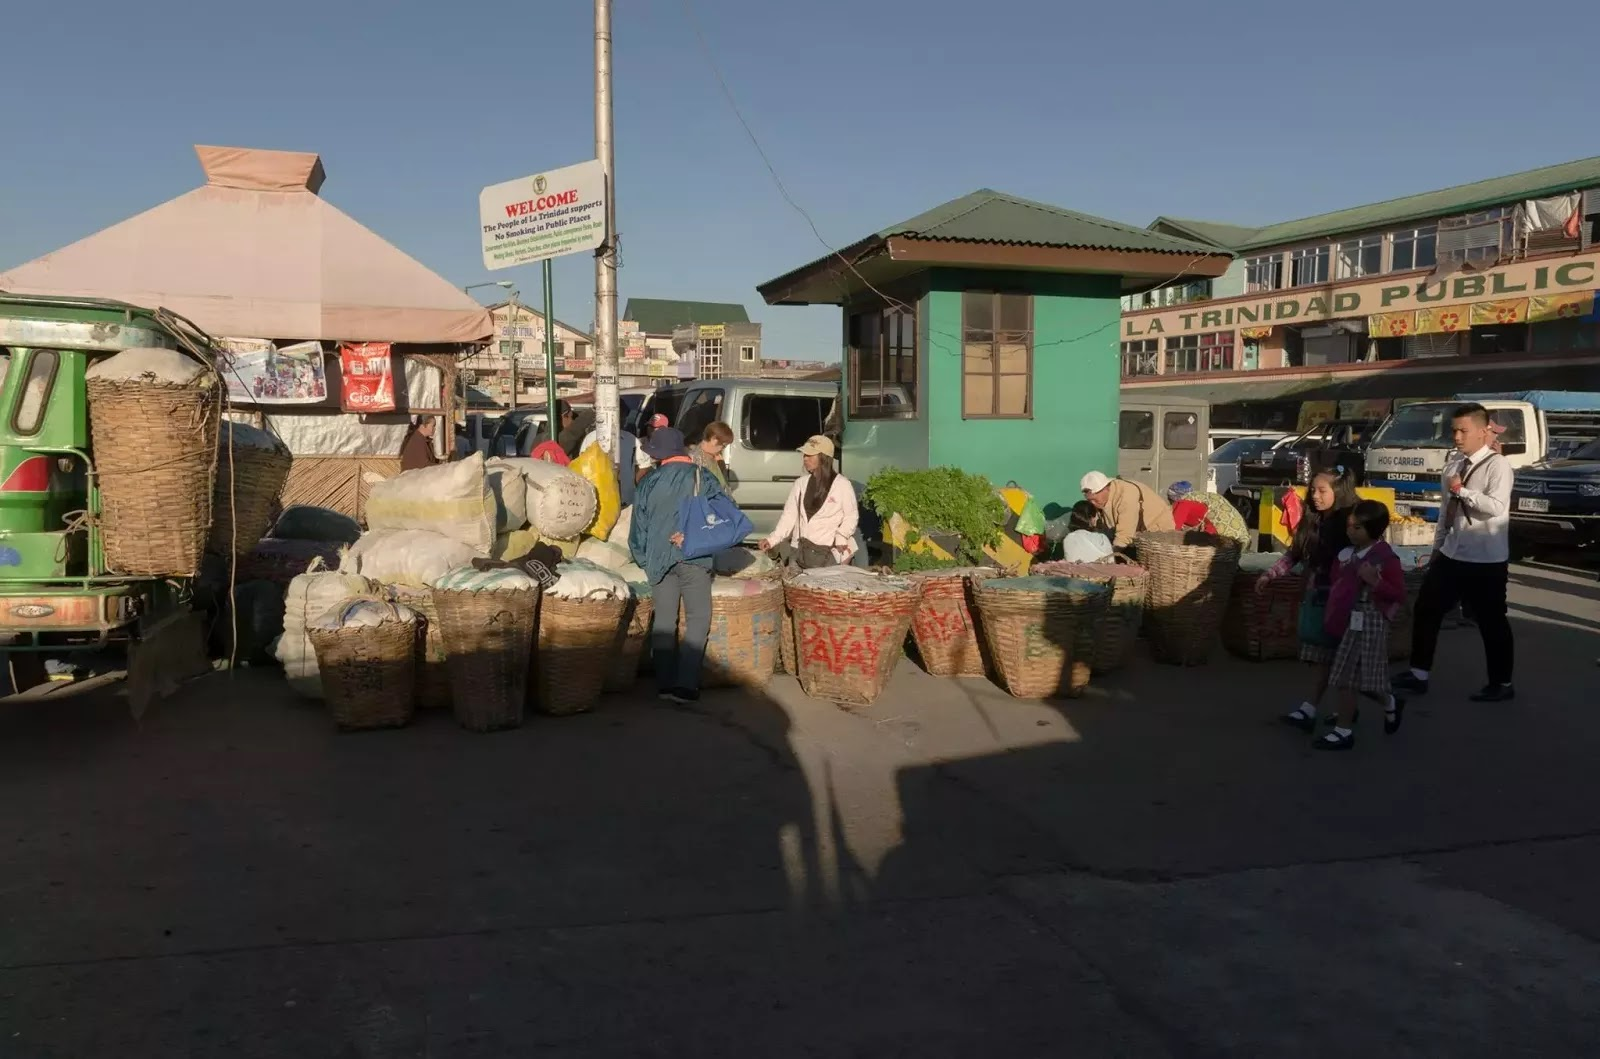 Parking Area La Trinidad Public Market Benguet Cordillera Administrative Region Philippines